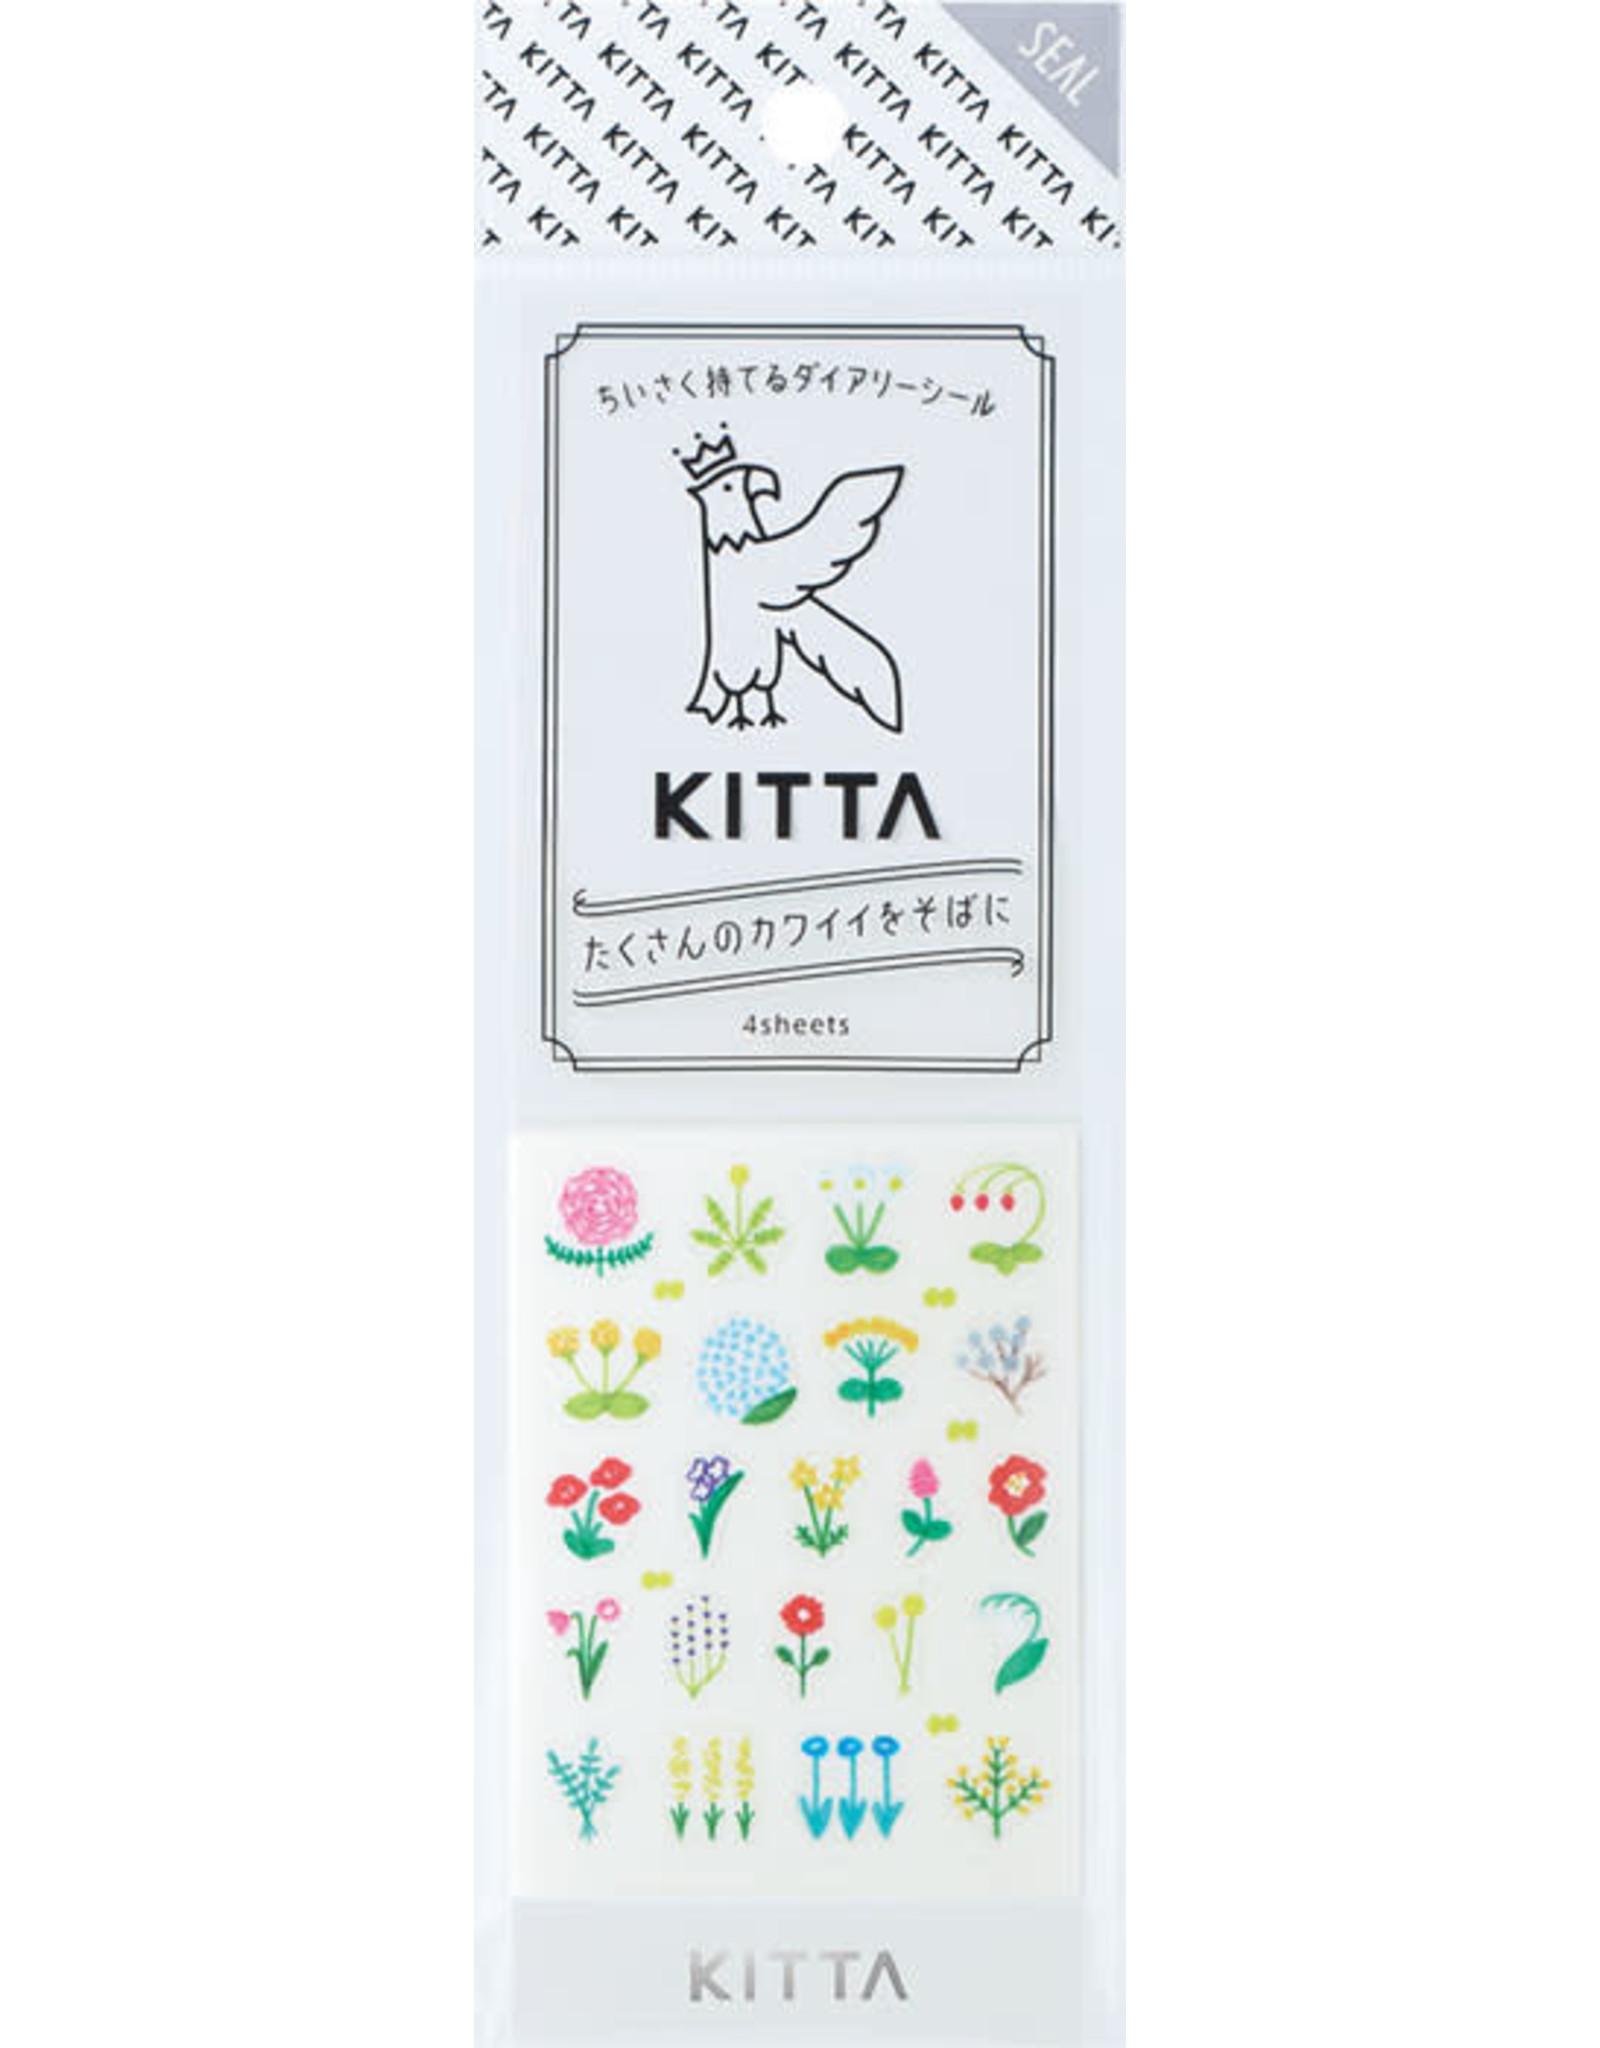 KING JIM CO., LTD. KITTA SEAL ICON(FLOWER)